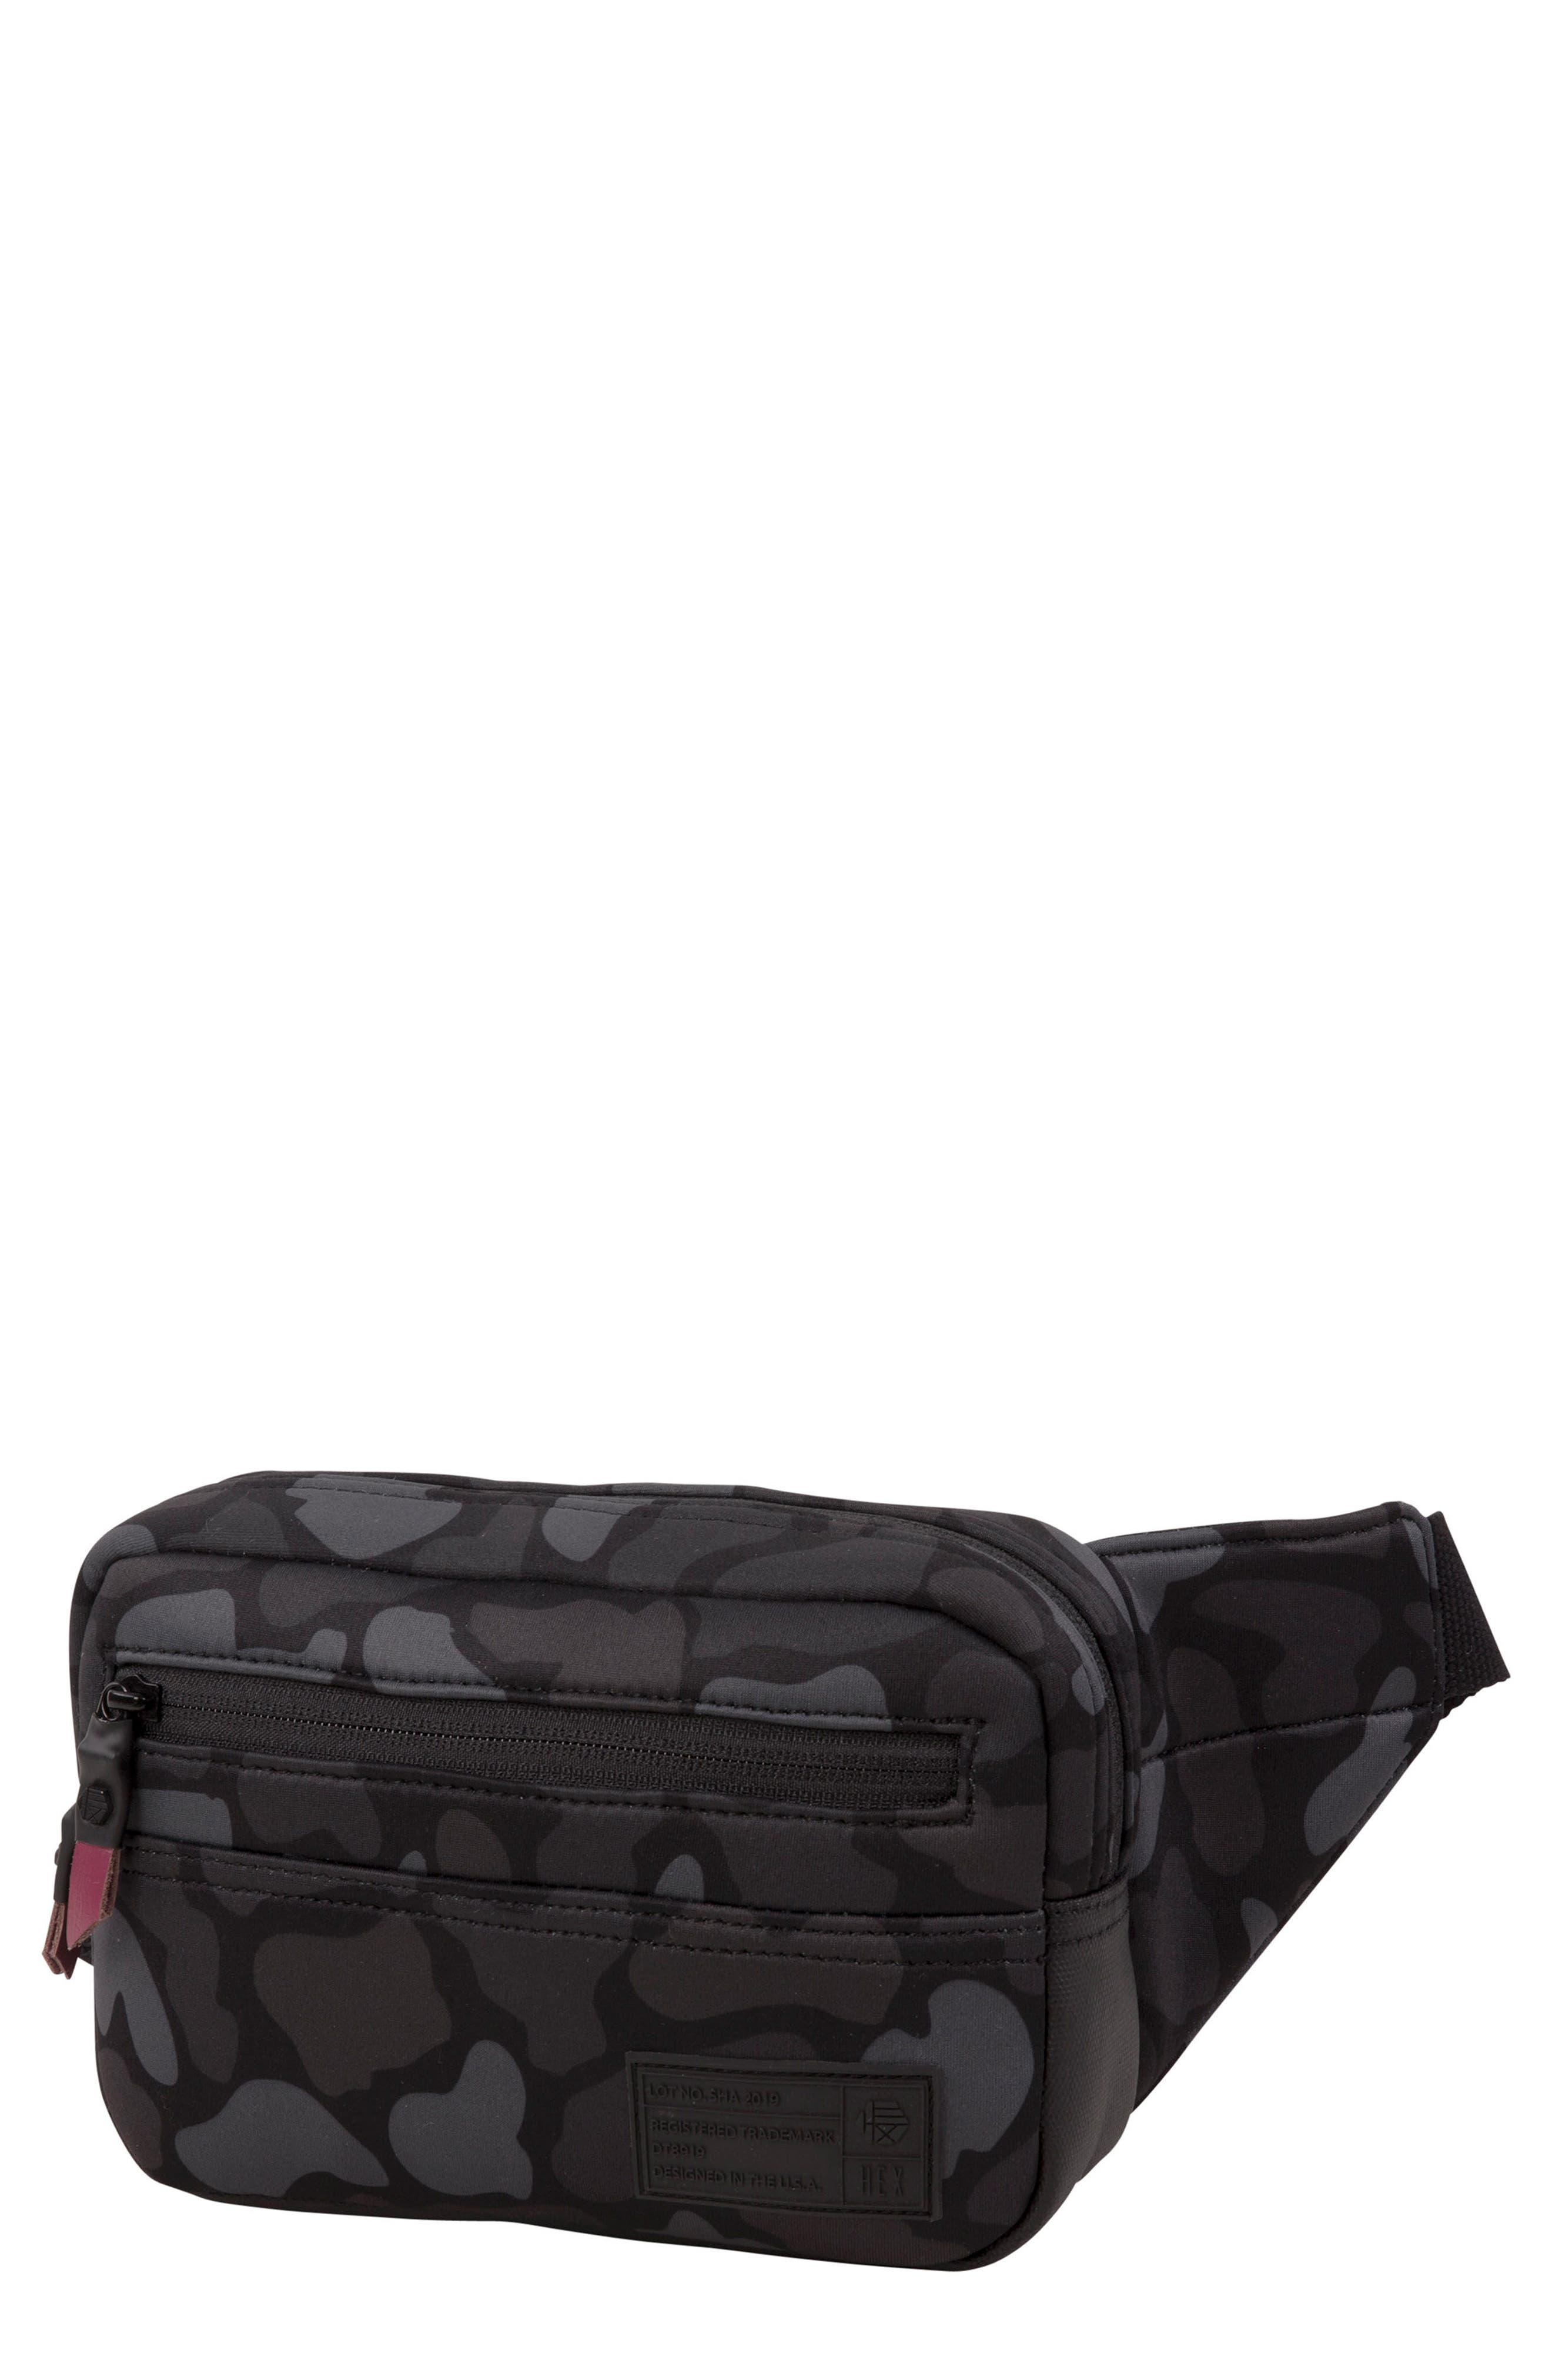 Belt Bag,                             Main thumbnail 1, color,                             CAMO NEOPRENE